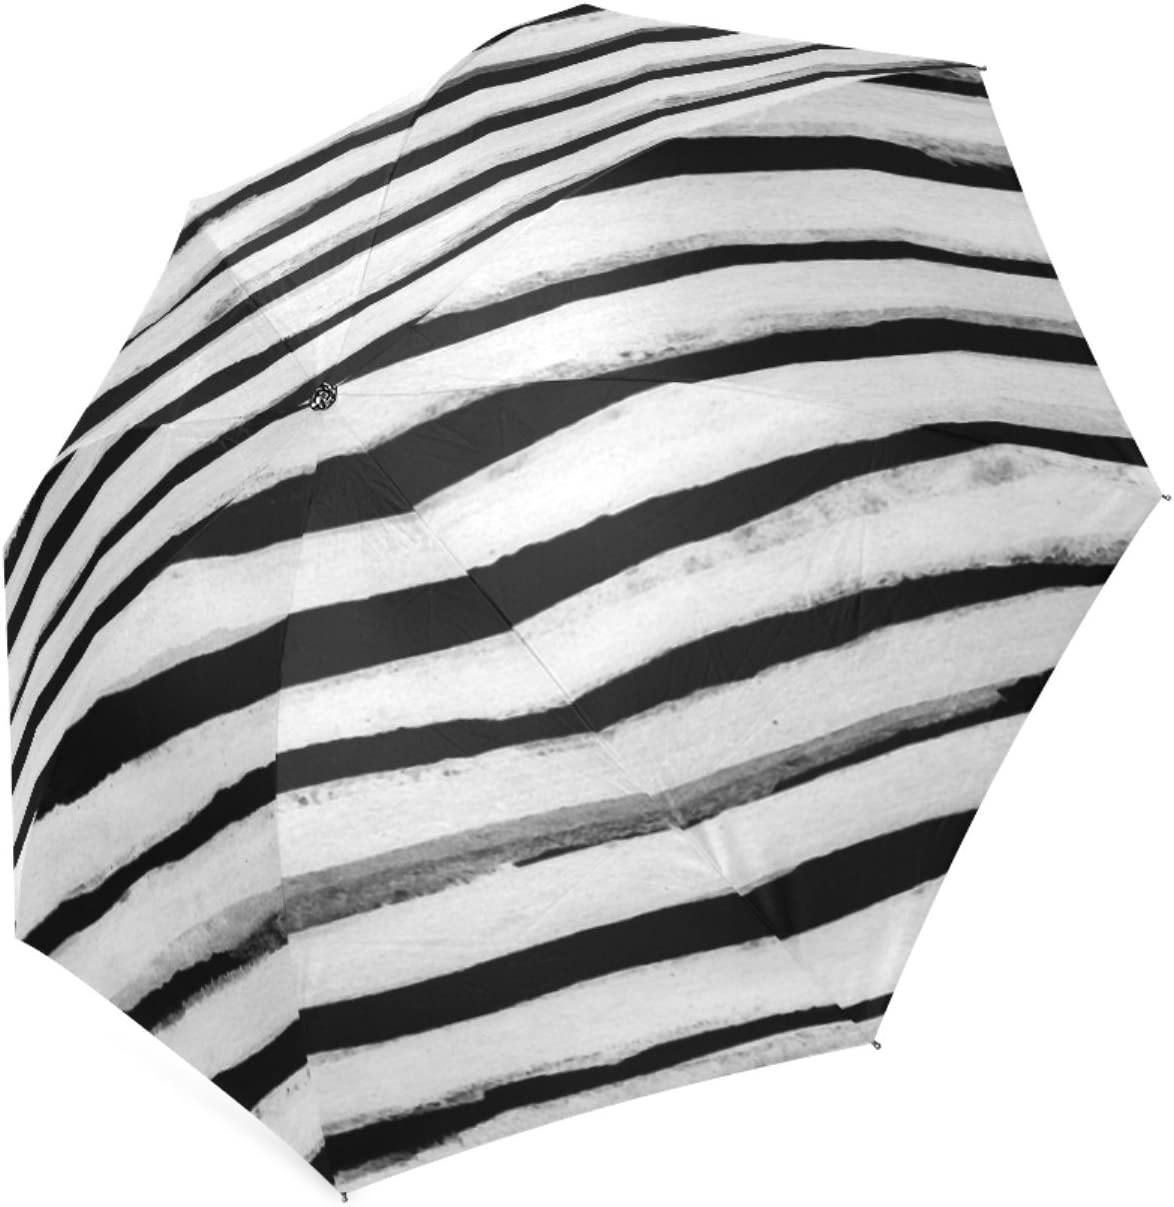 Beautytool Custom Black And White Stripes Foldable Rain Umbrella